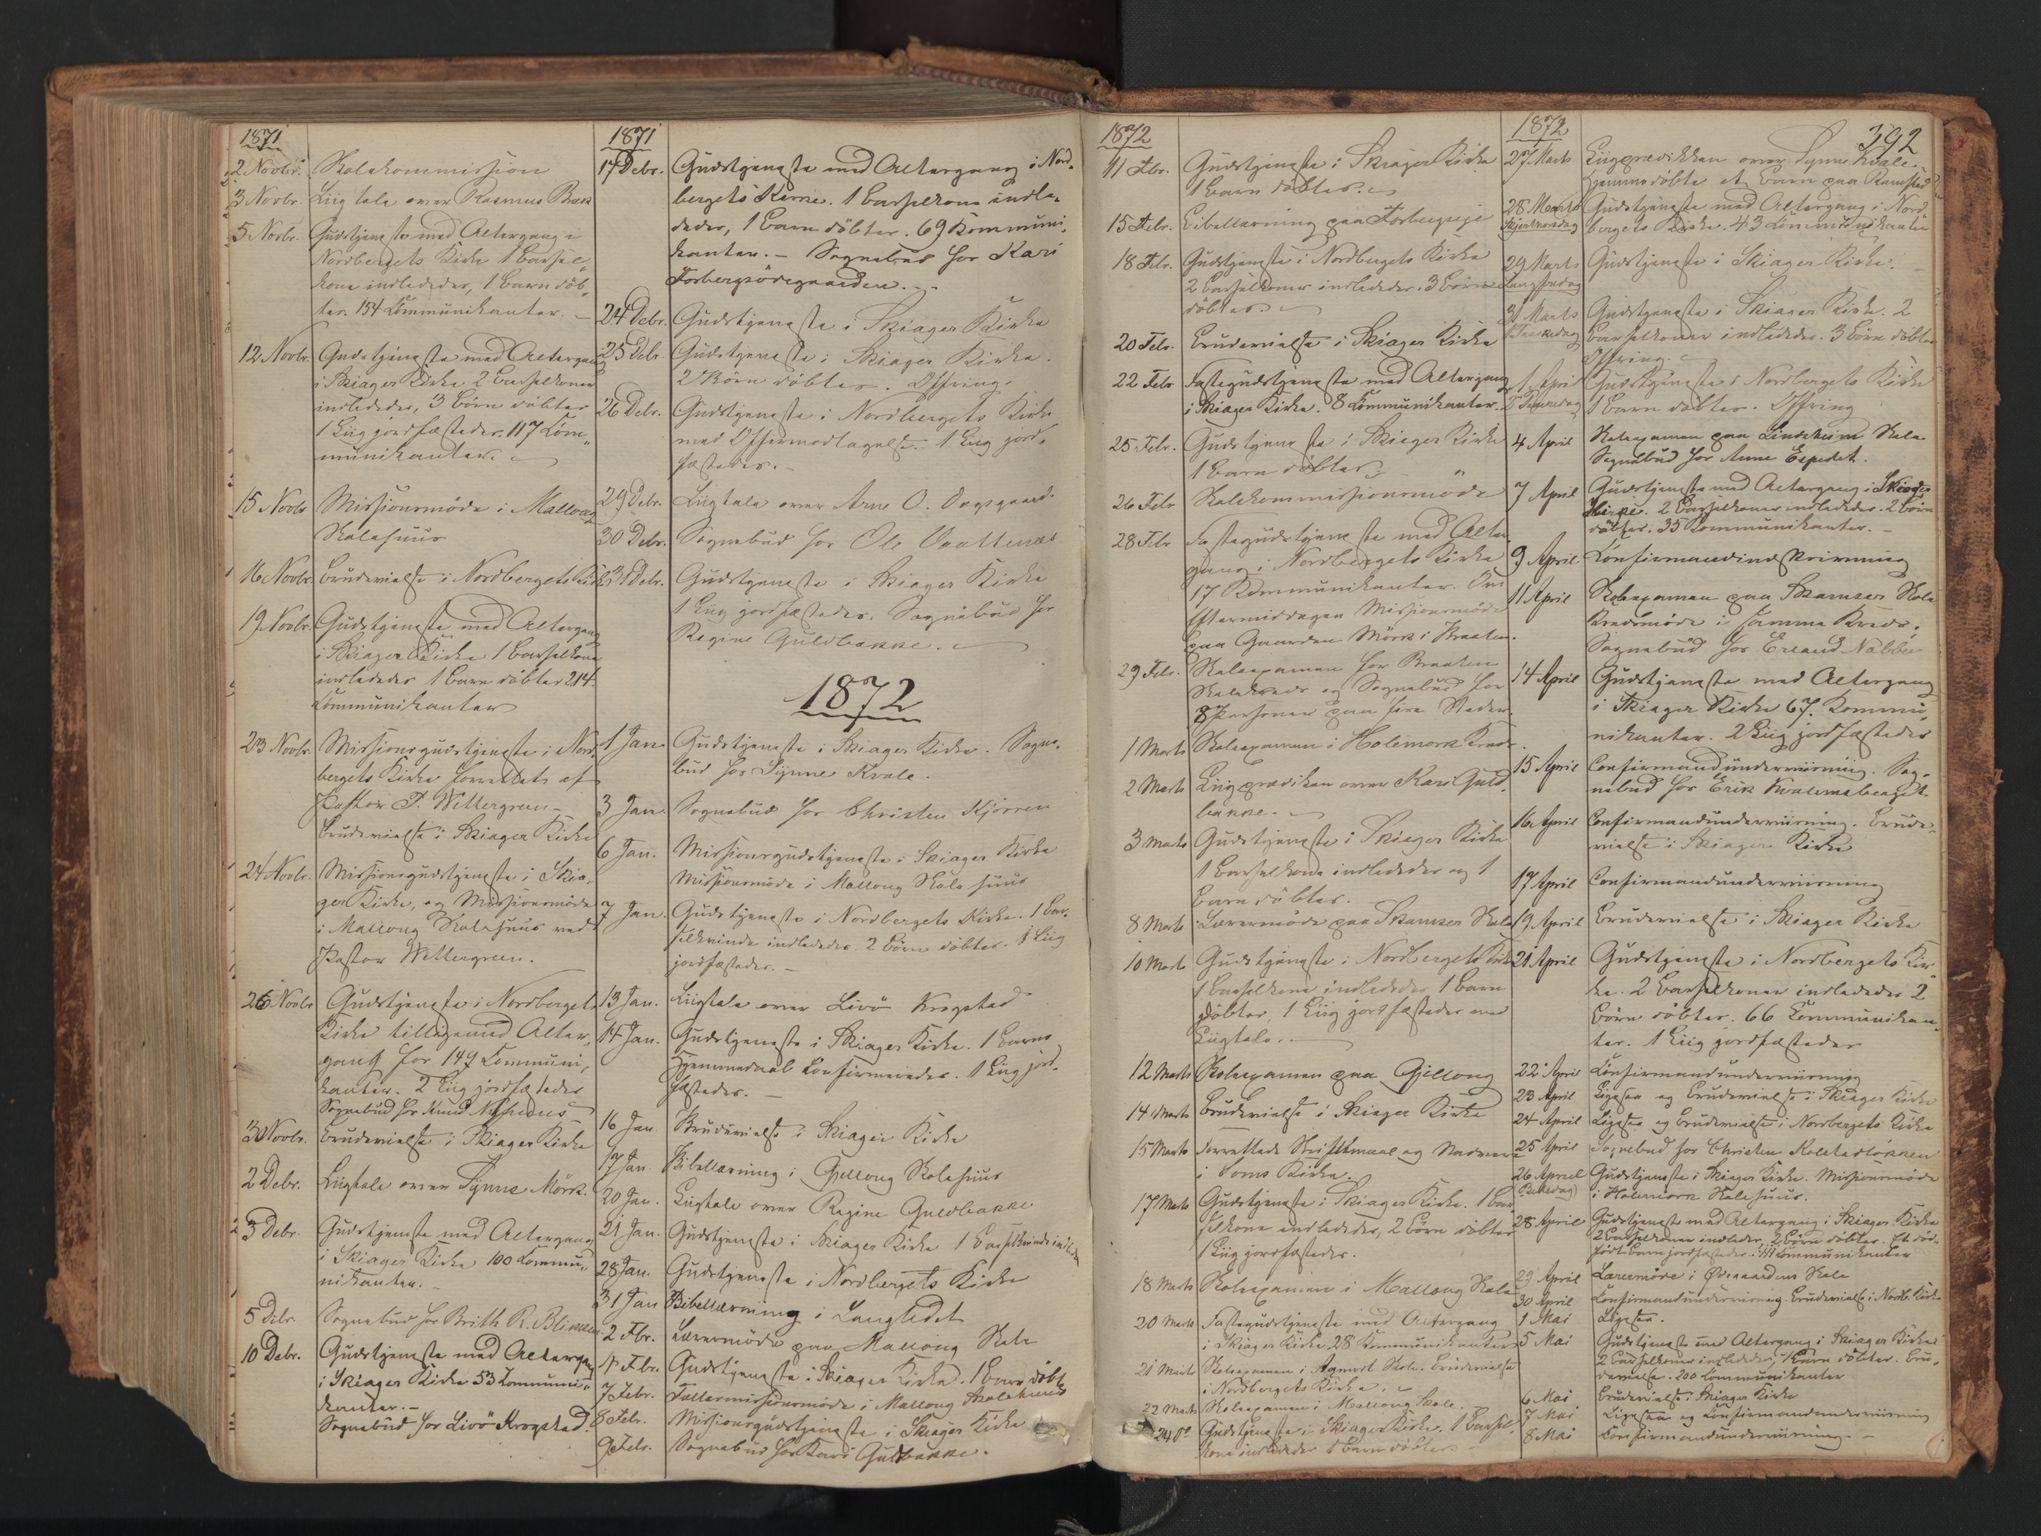 SAH, Skjåk prestekontor, Ministerialbok nr. 1, 1863-1879, s. 392